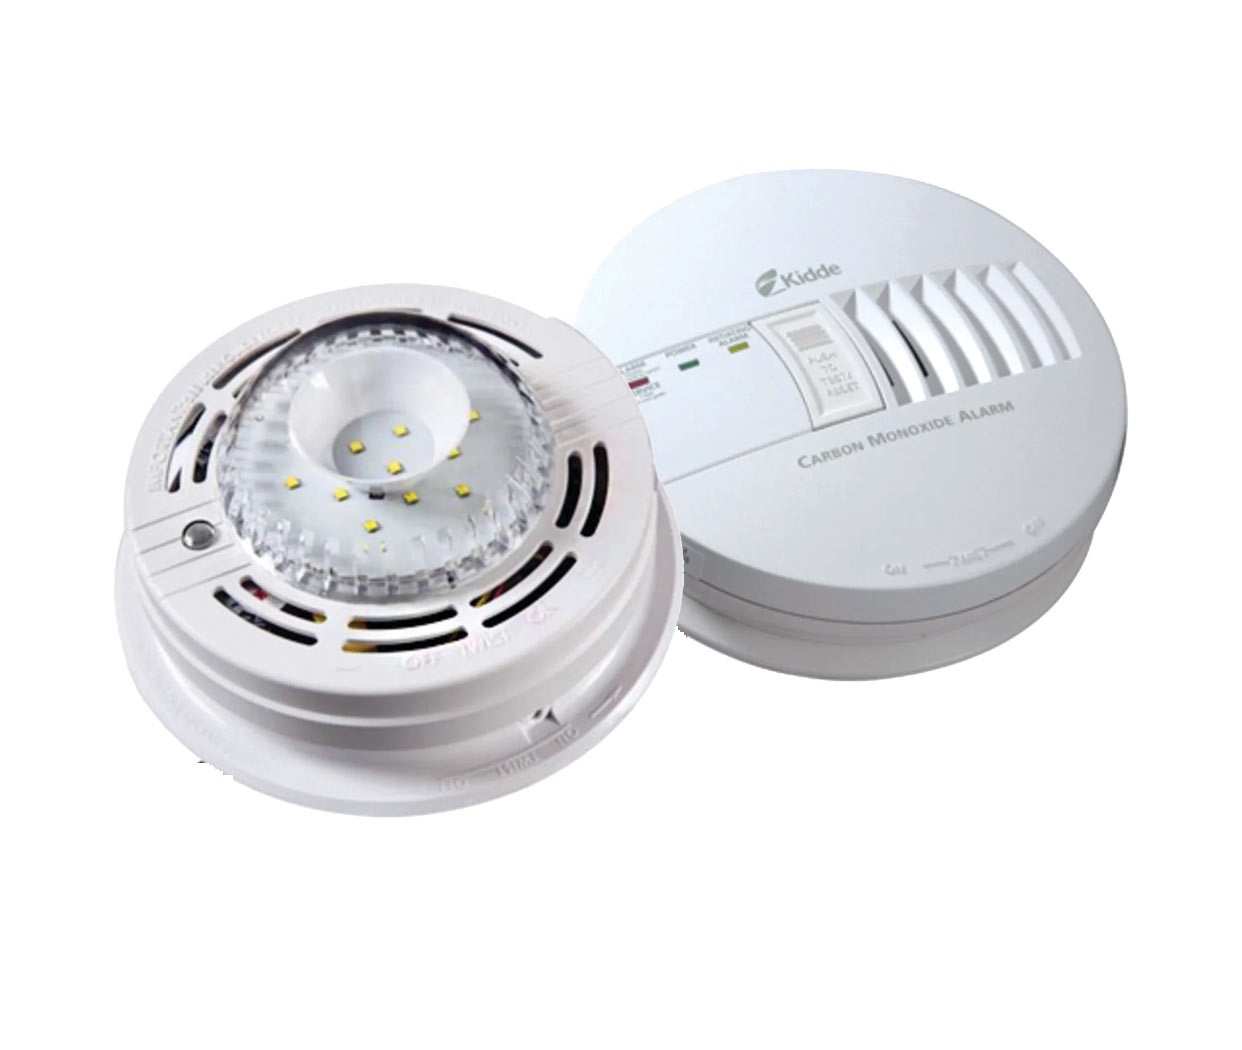 Kidde Carbon Monoxide Alarm with Strobe Light Price: $159.95